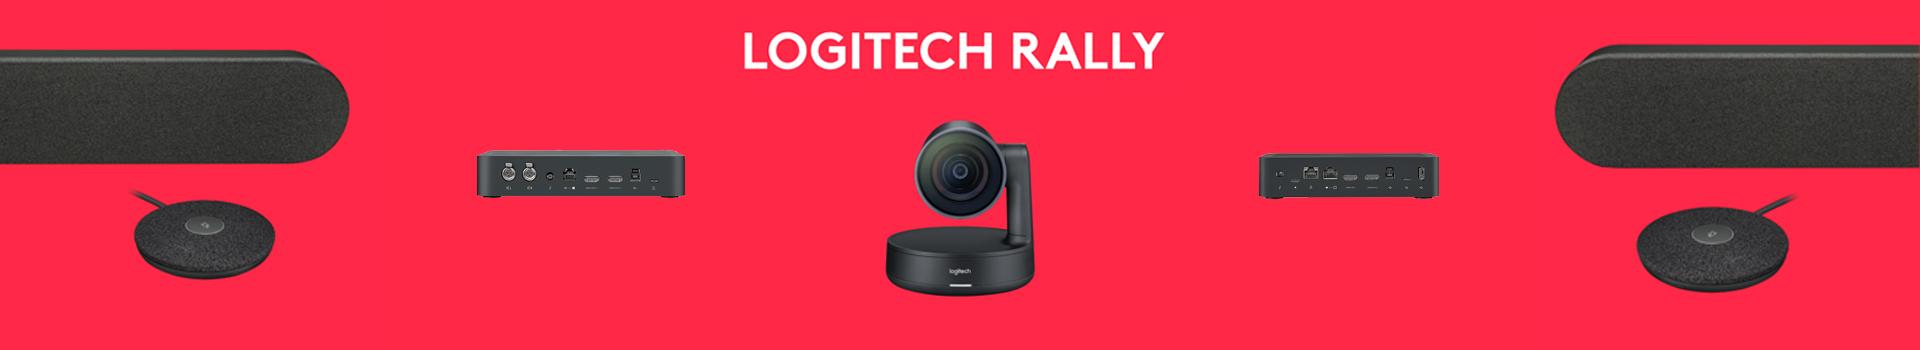 logitech_rally